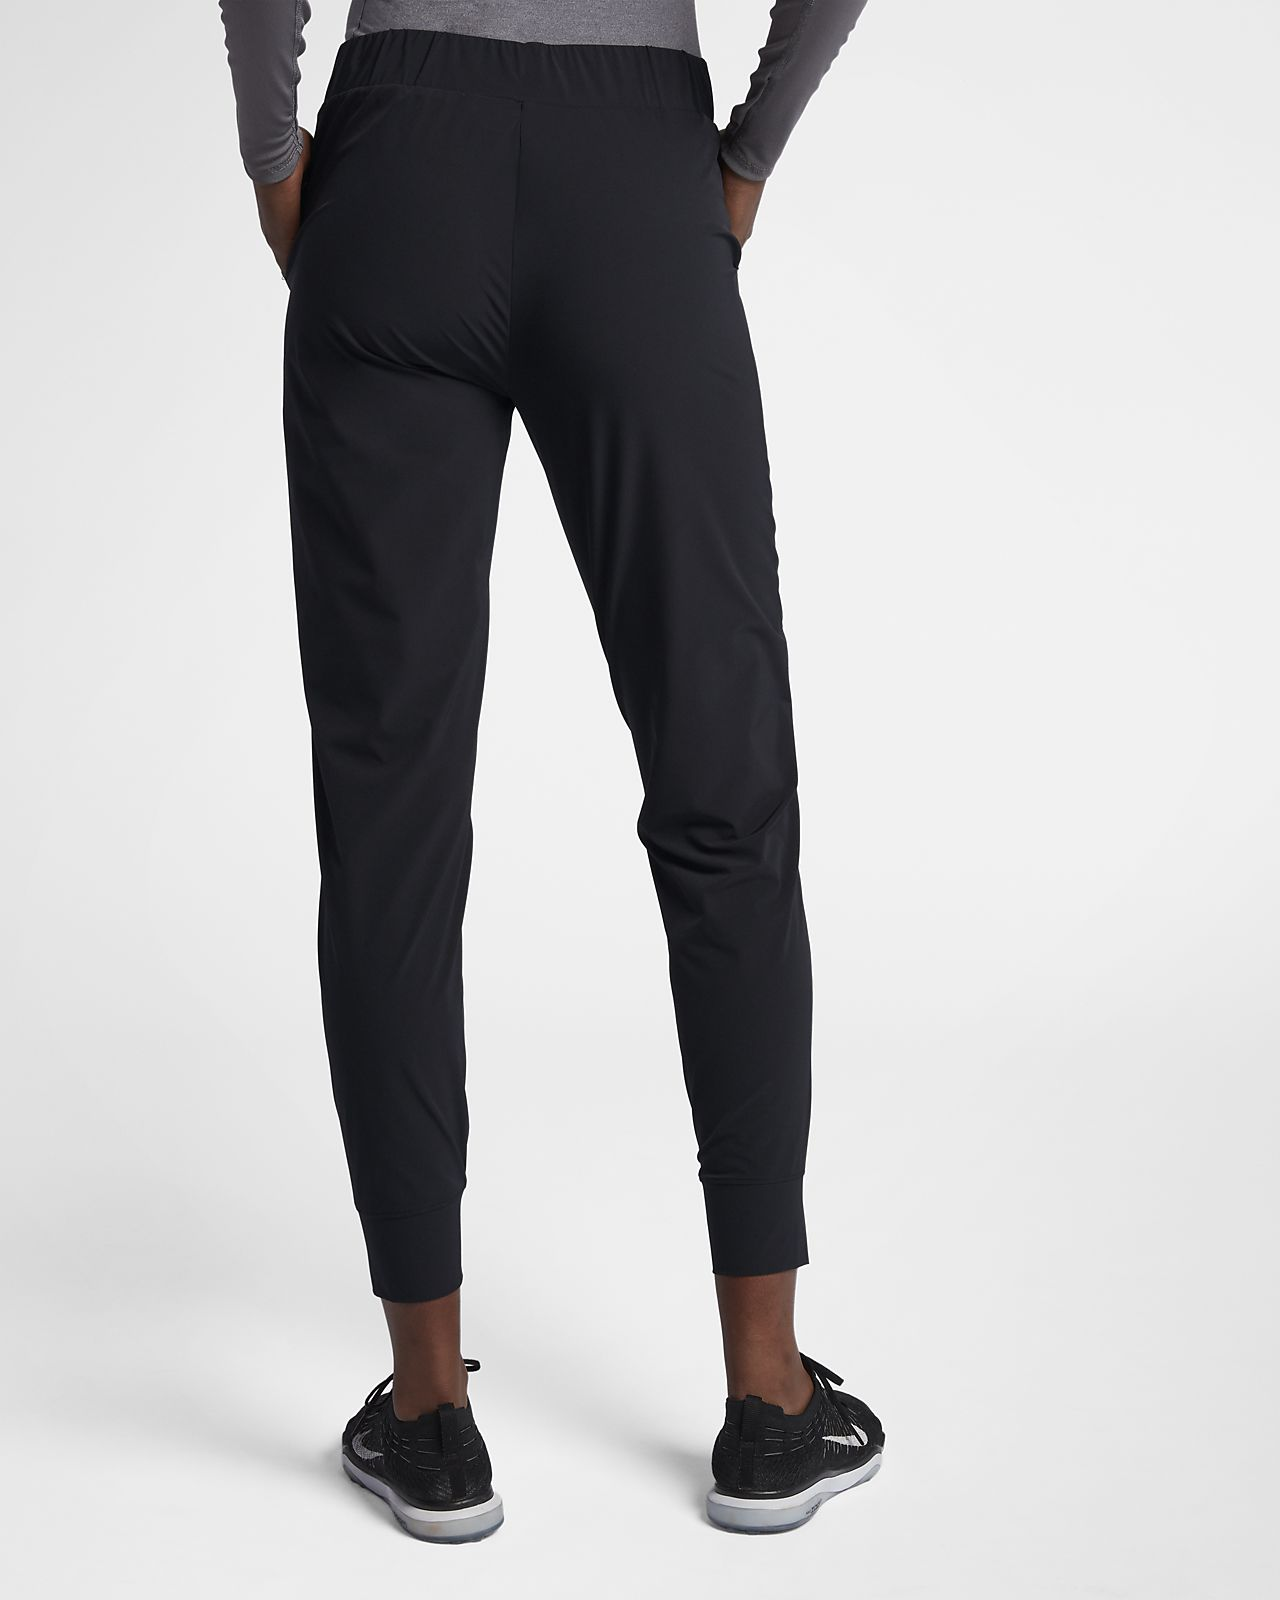 Tiro Pantalones Entrenamiento Medio Bliss Para Nike De Lux Mujer q1z1nwEC